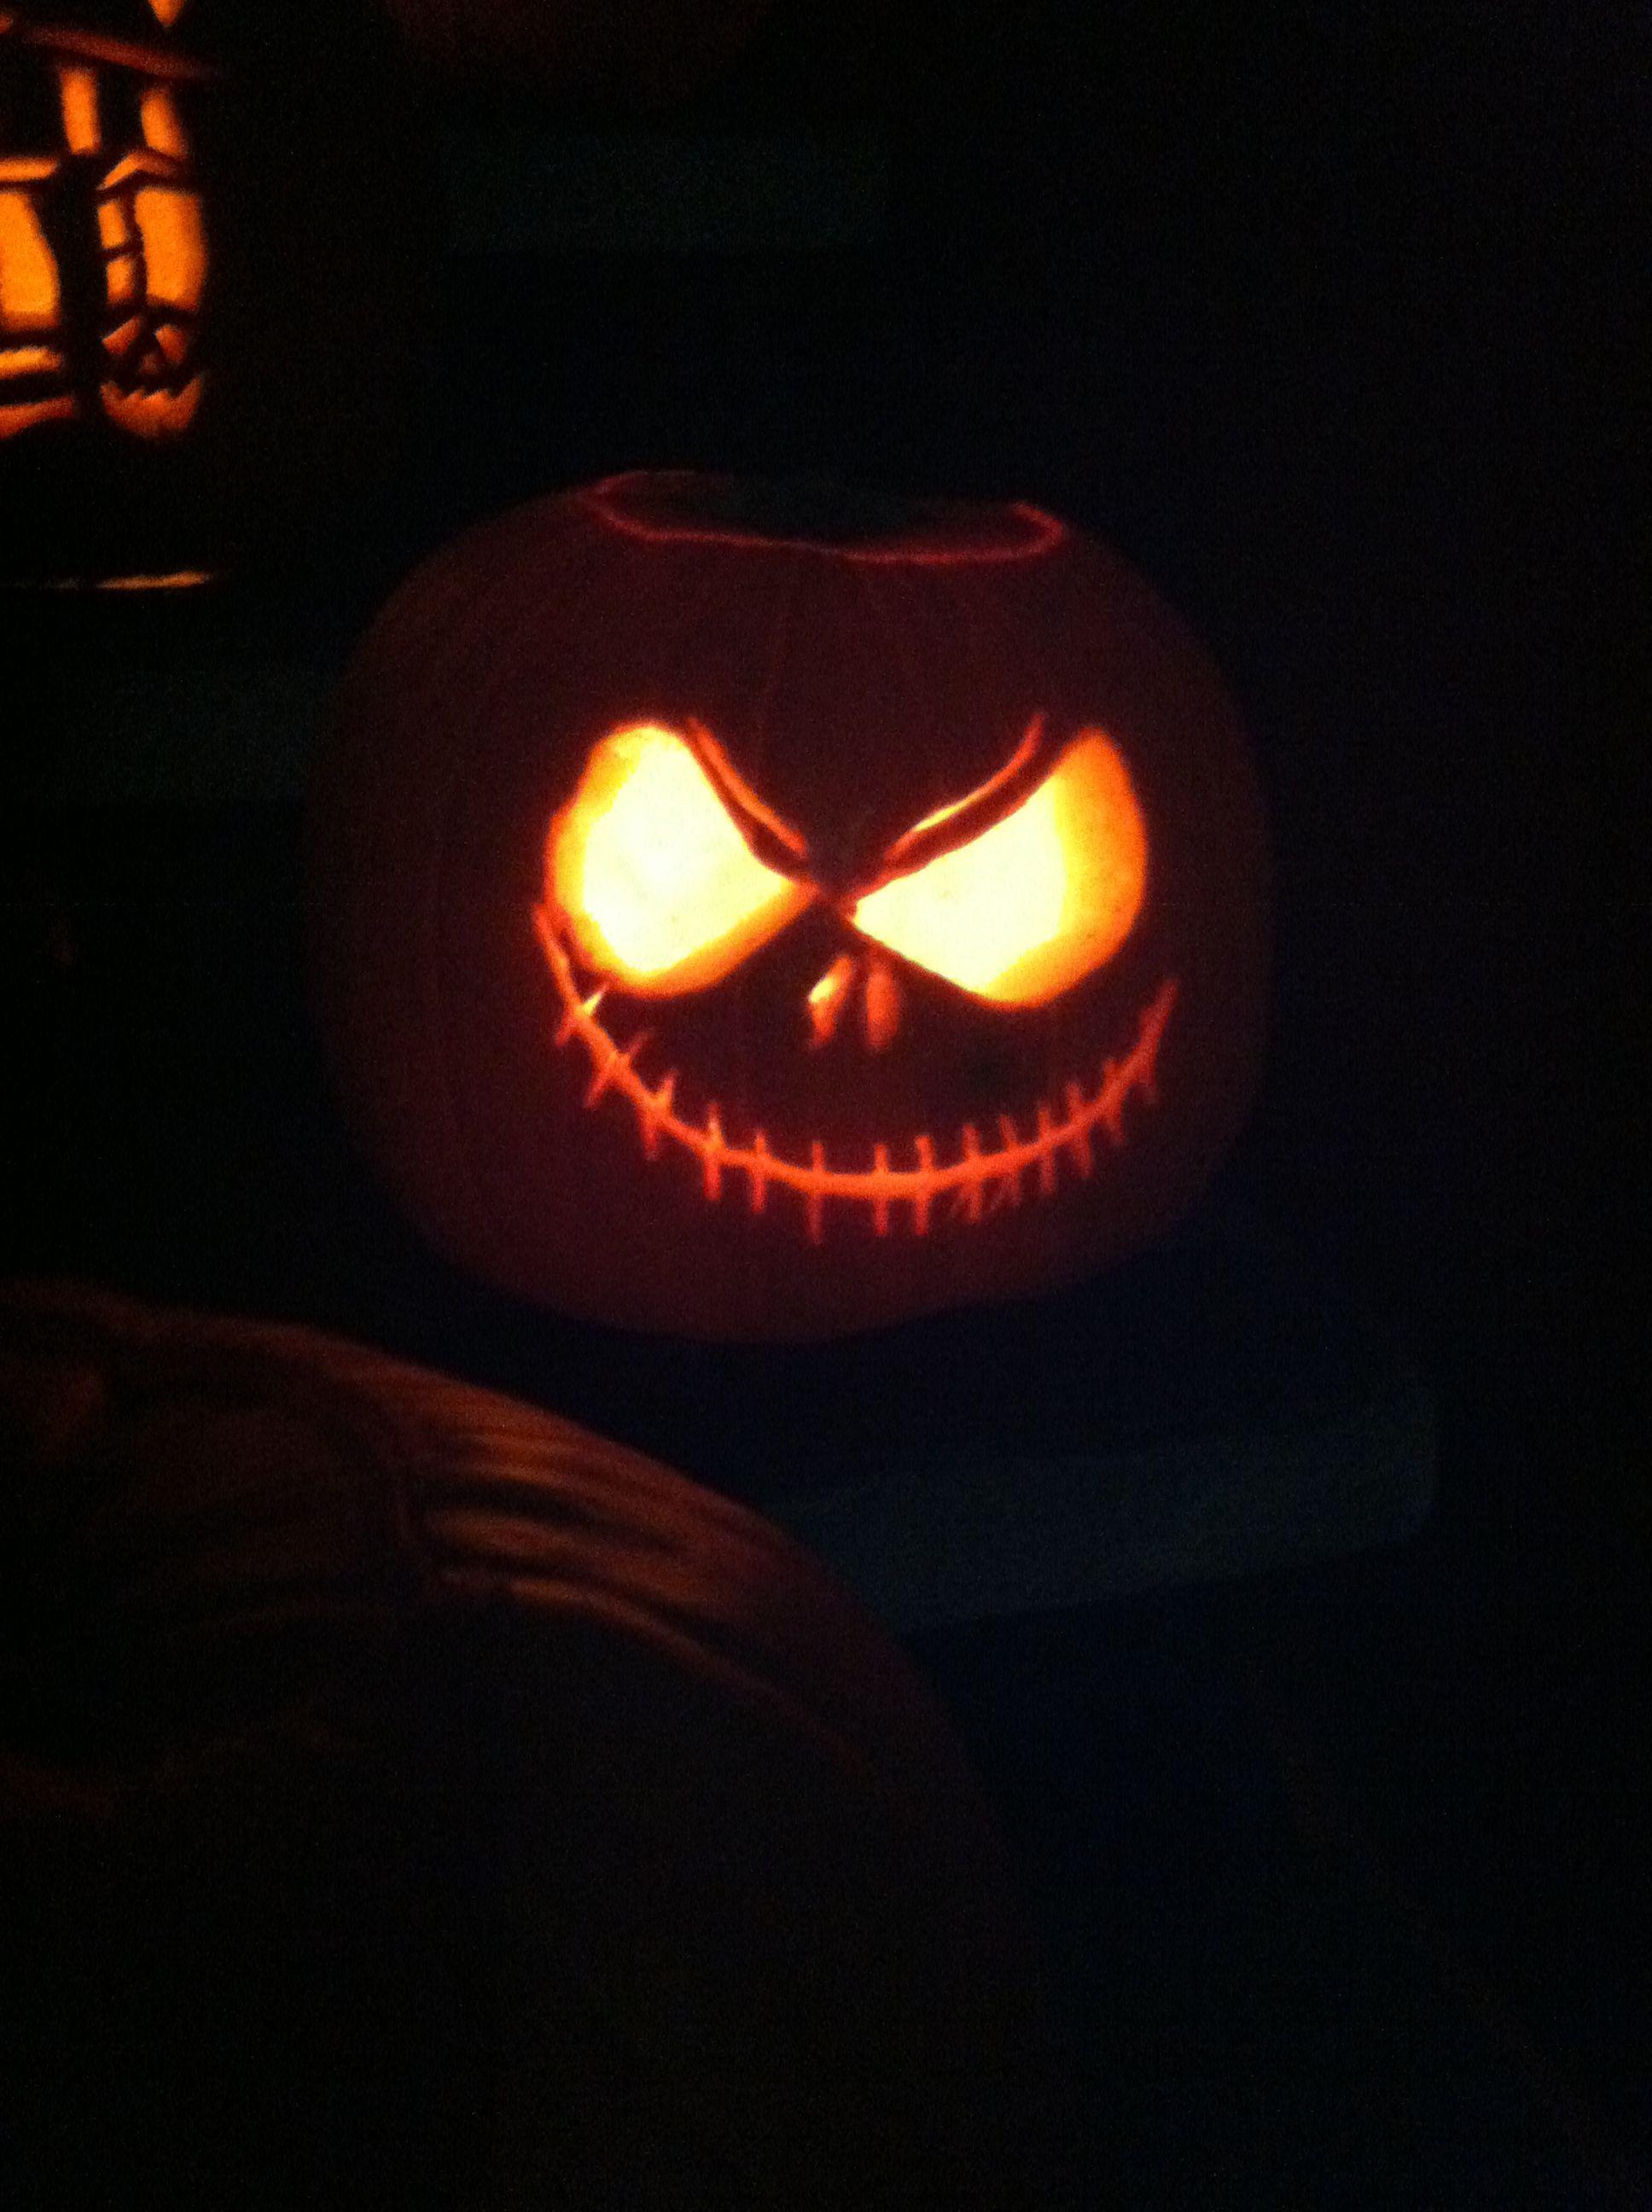 nightmare before christmas jack o lanterns - Nightmare Before Christmas Jack O Lantern